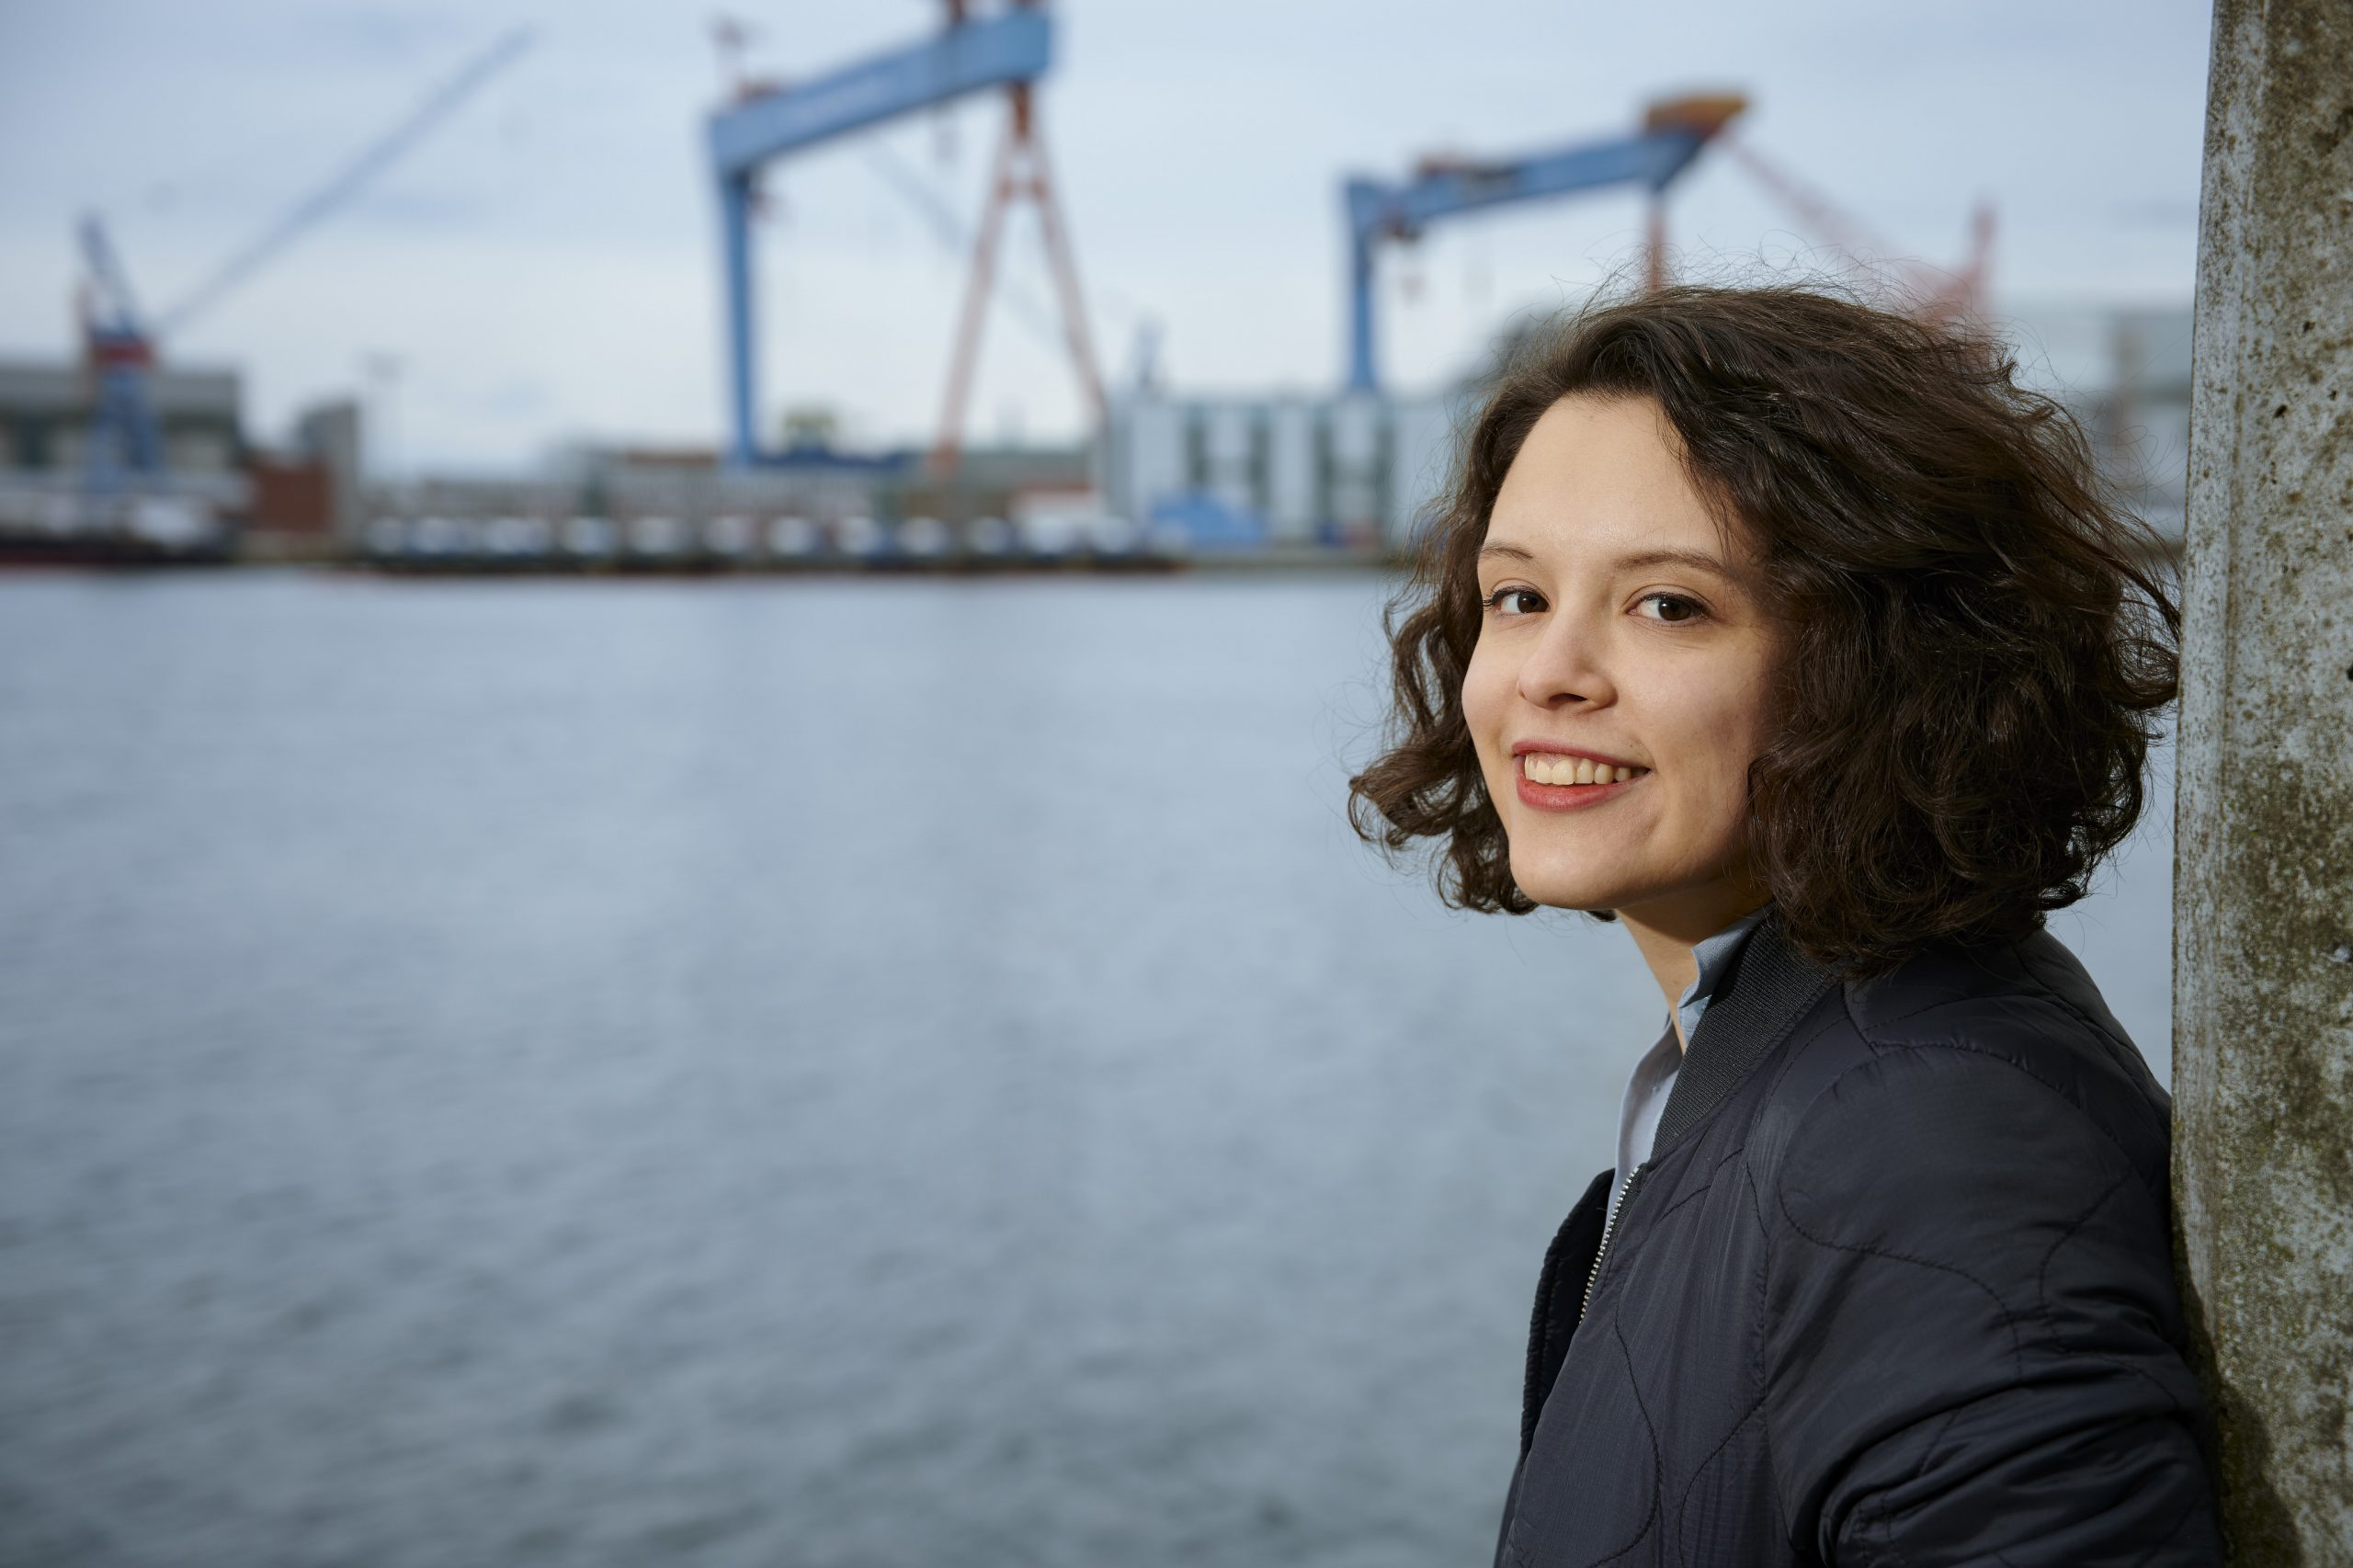 Delara Burkhardt, @Bernd Marzi